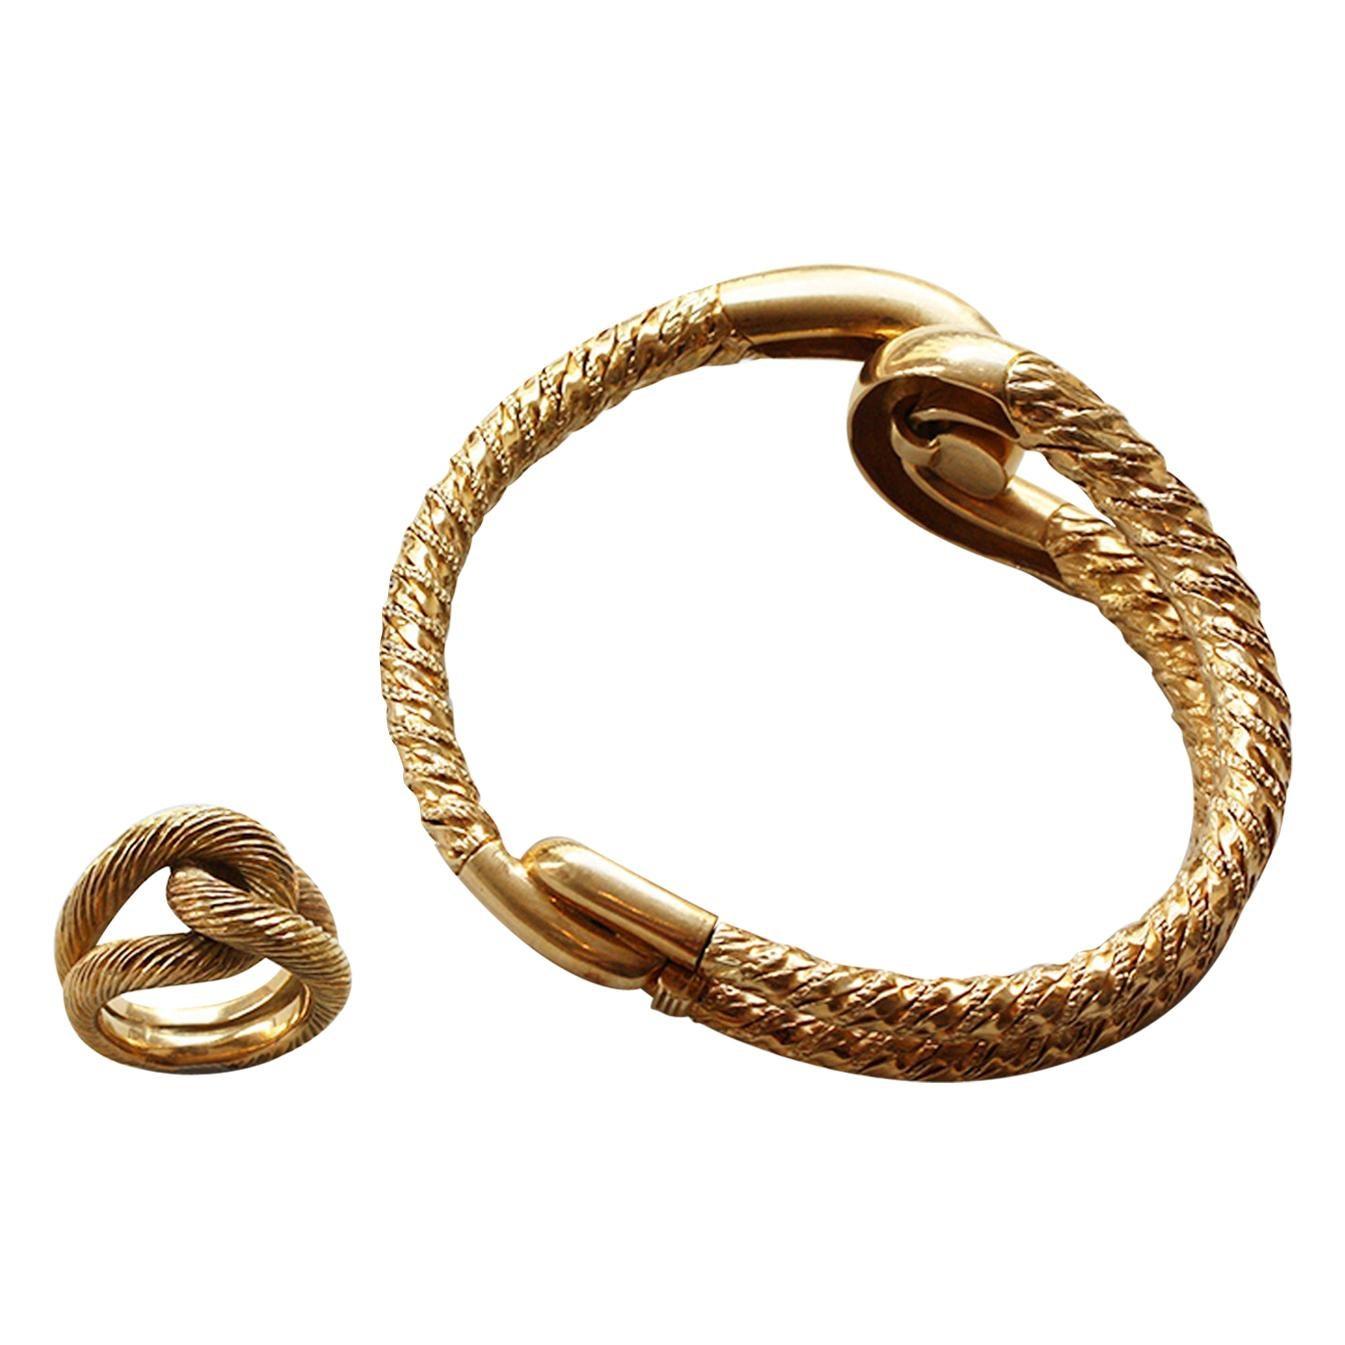 Cartier Paris by Georges Lenfant Gold Knot Bracelet and Ring